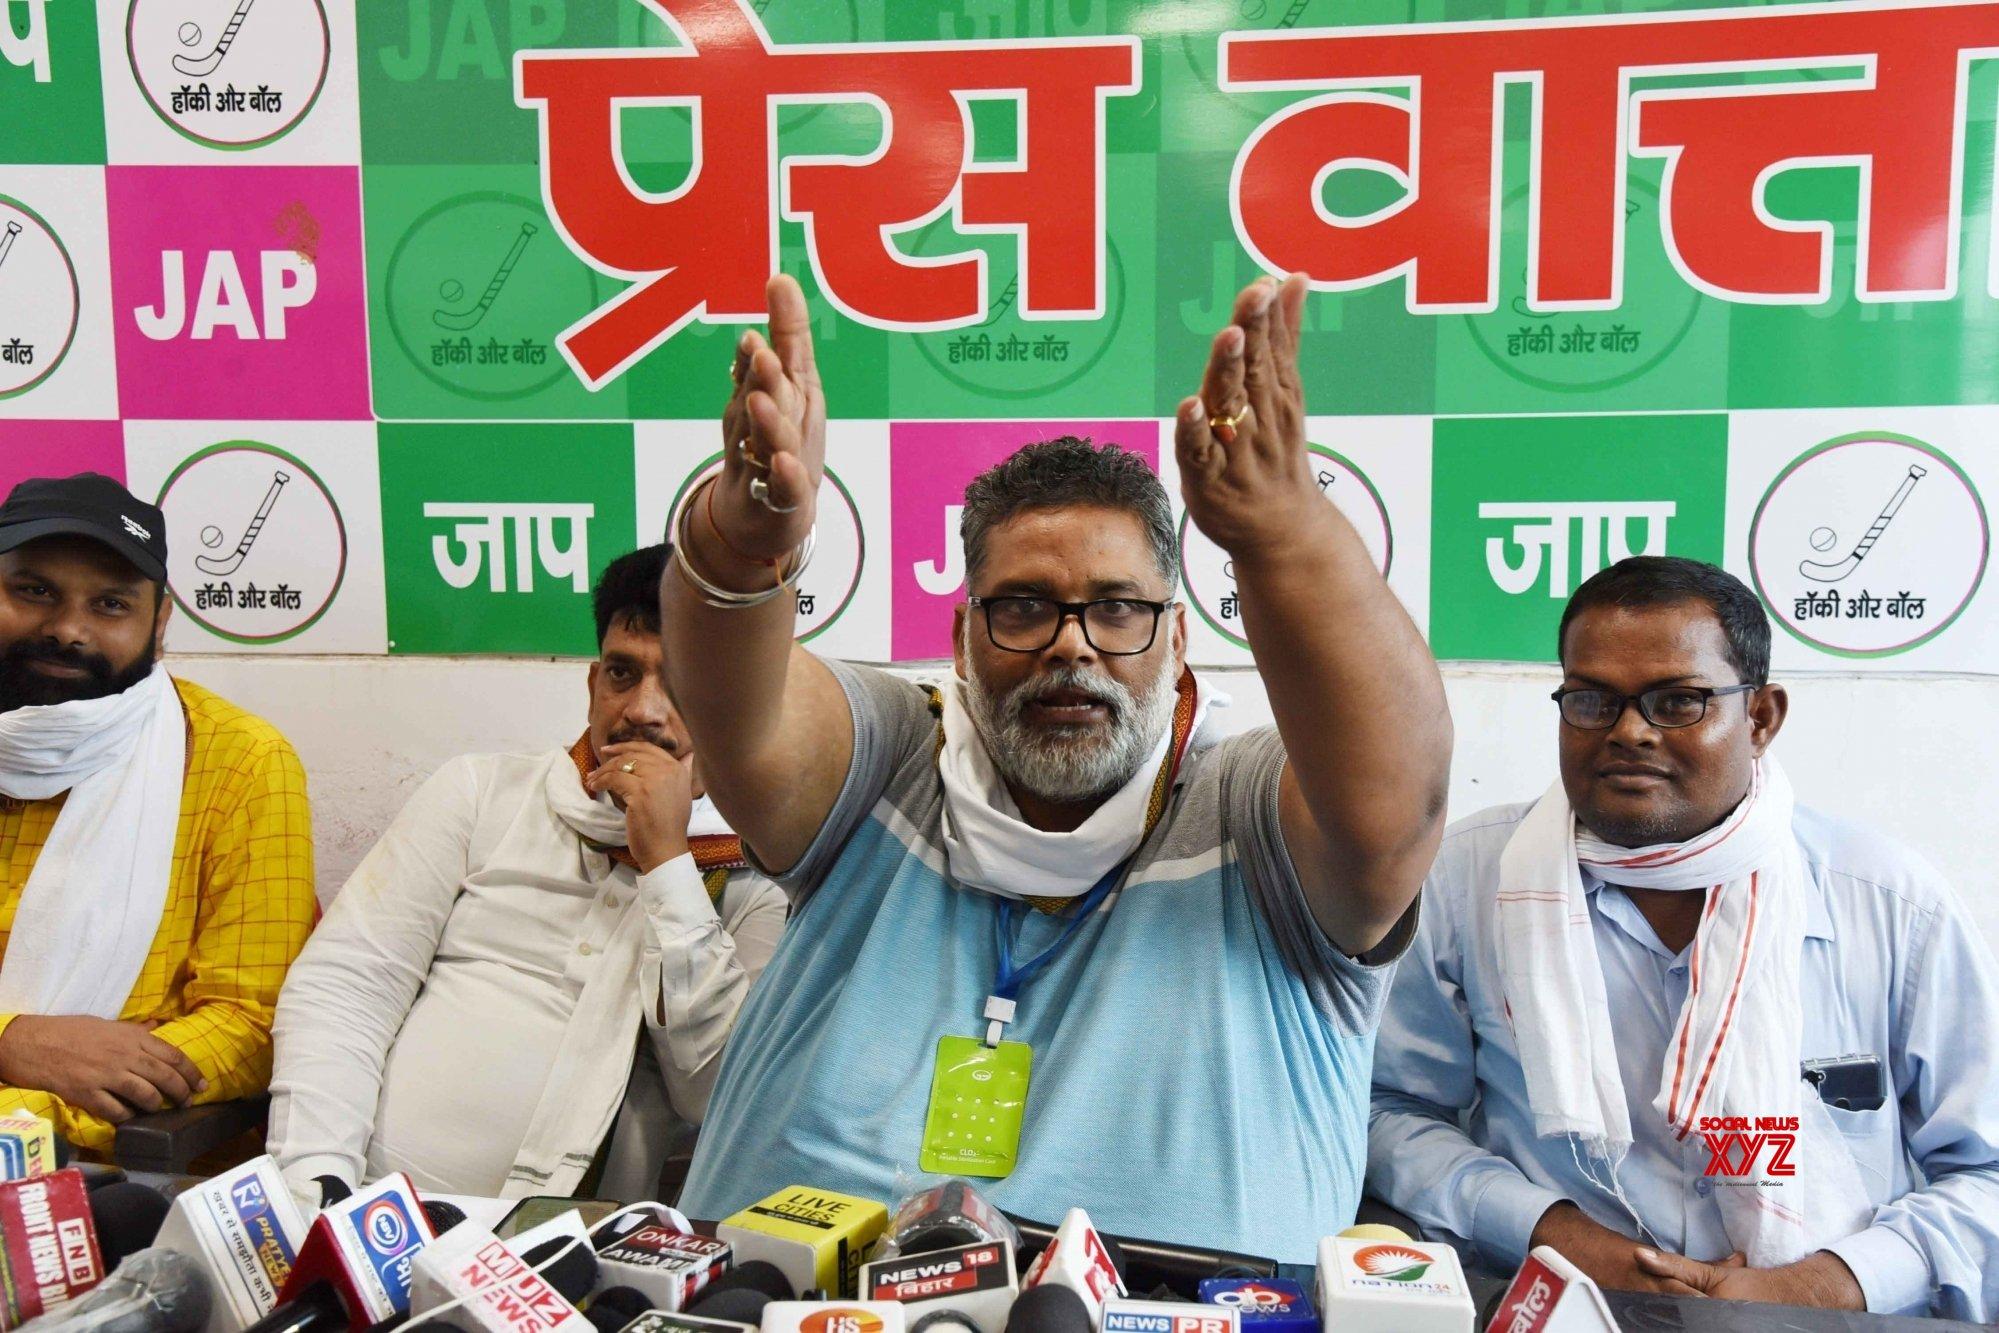 Patna: Pappu Yadav's press conference on Vikas Dubey's encounter #Gallery